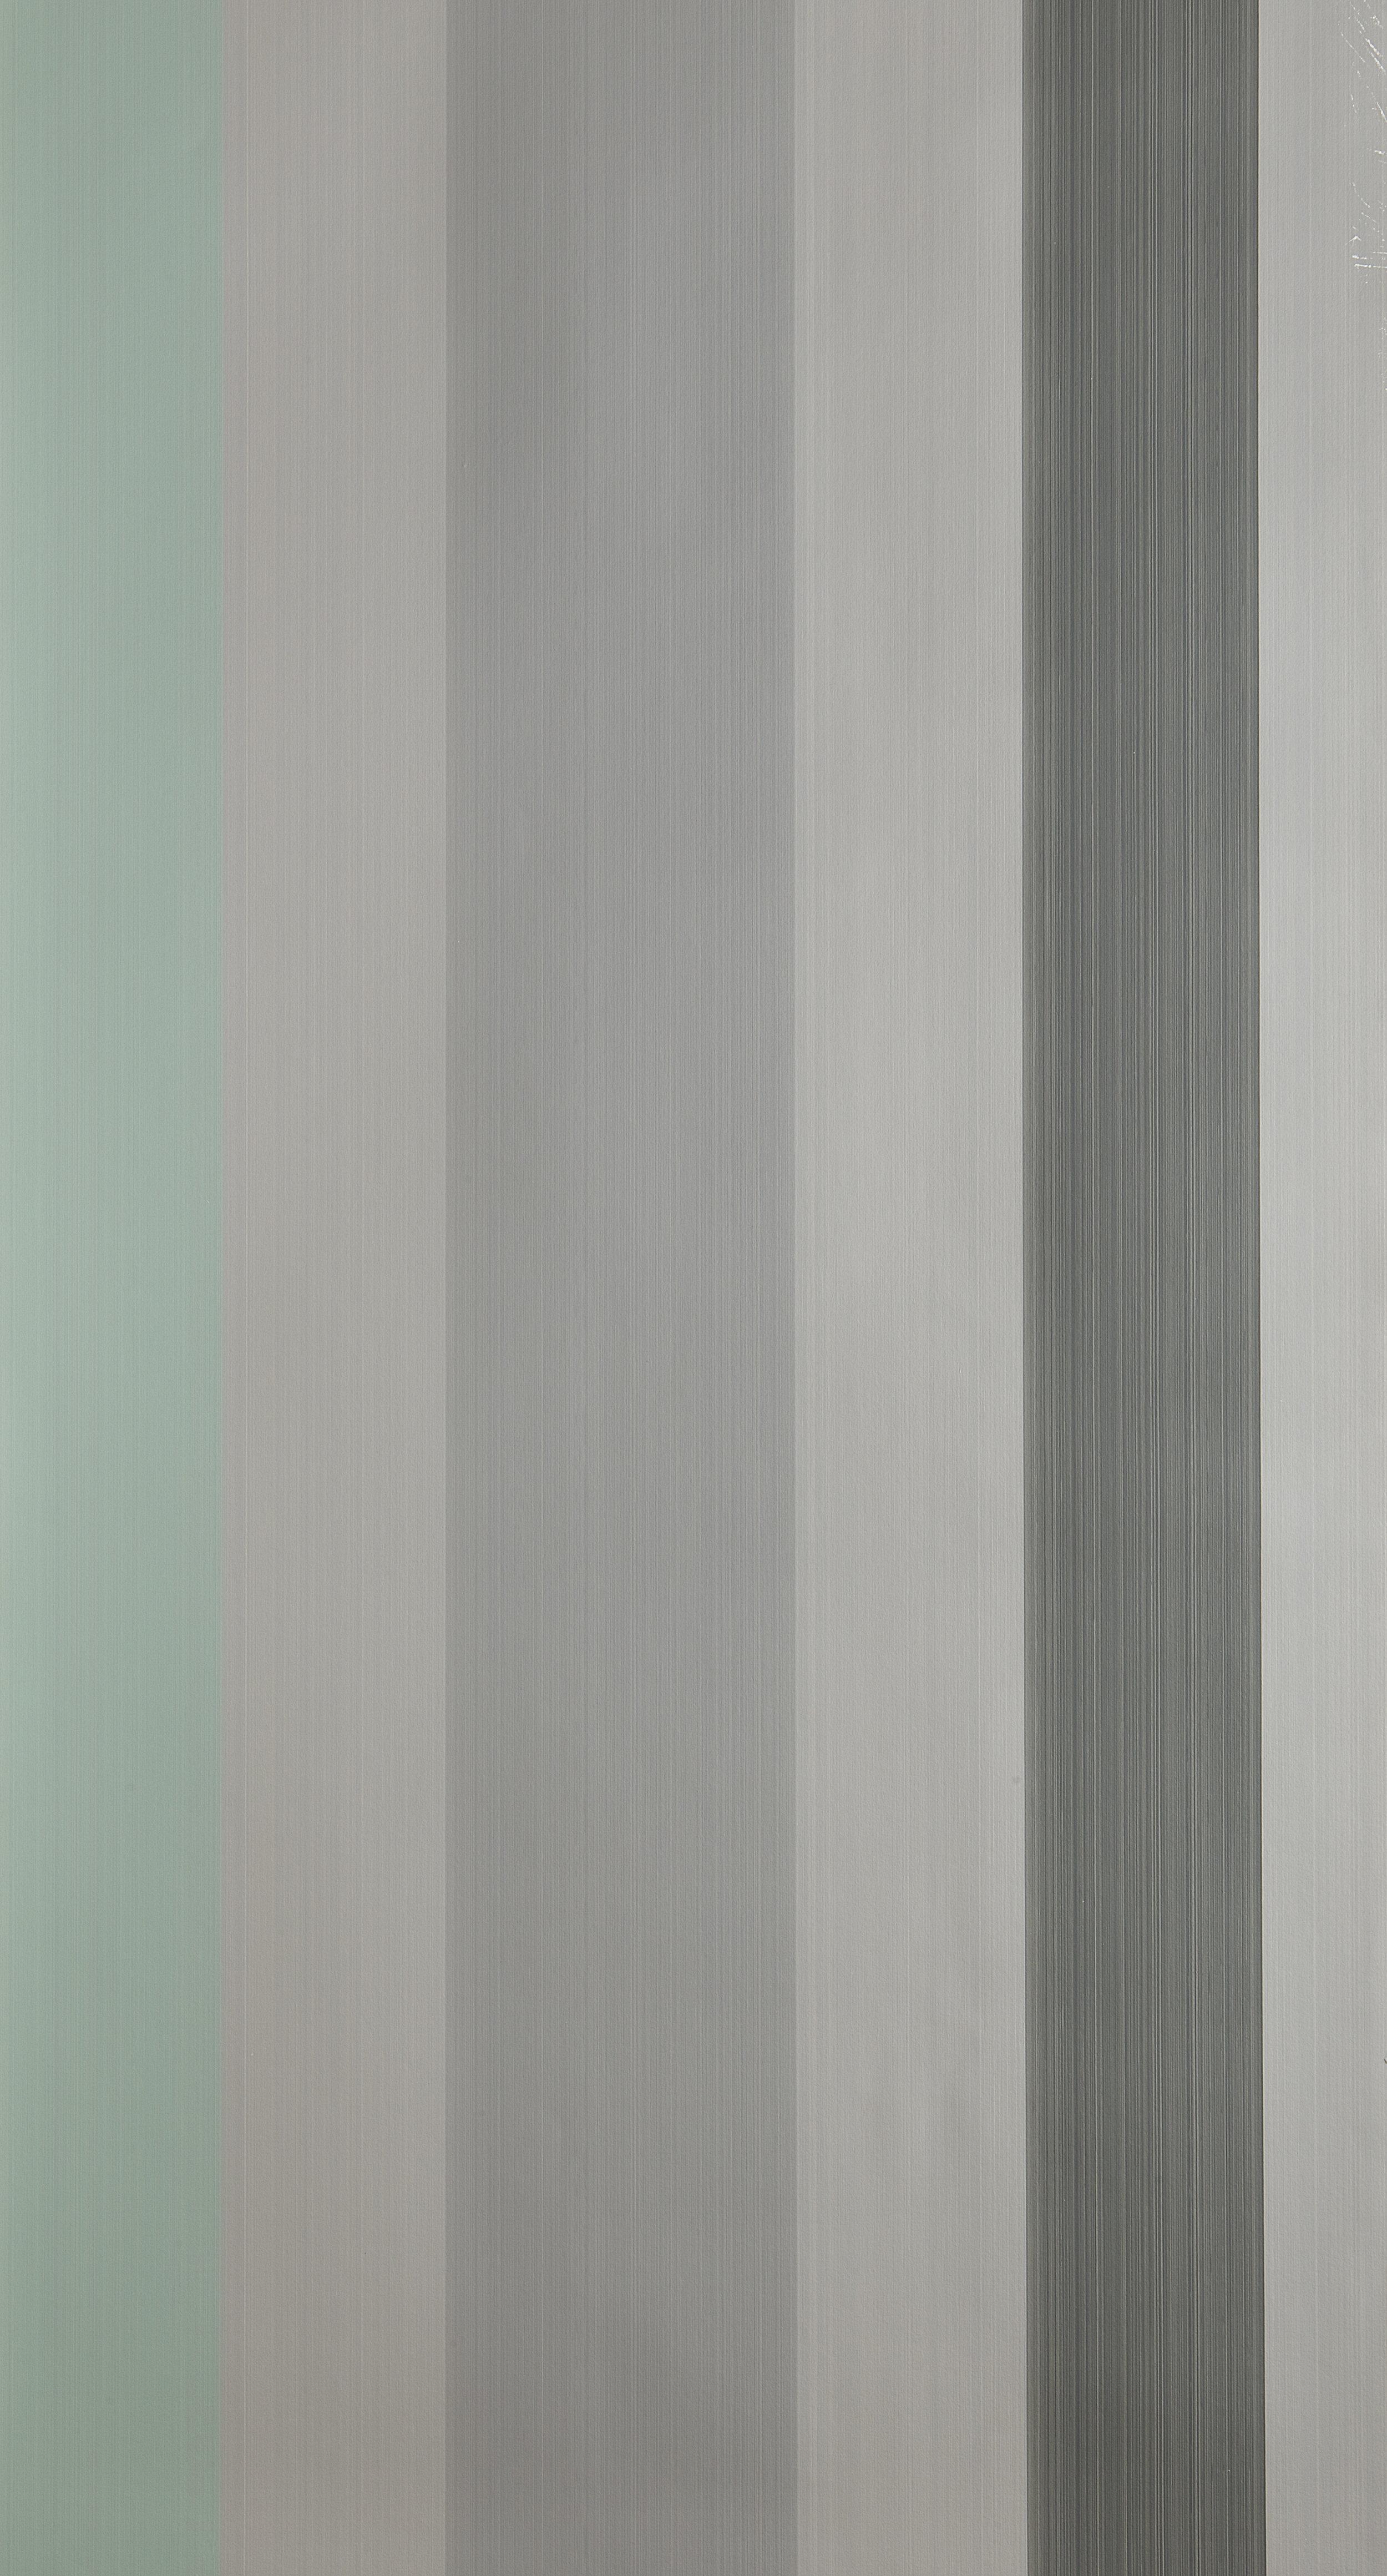 Chromatic Stripe 4202 $195 Per Roll  Order Now